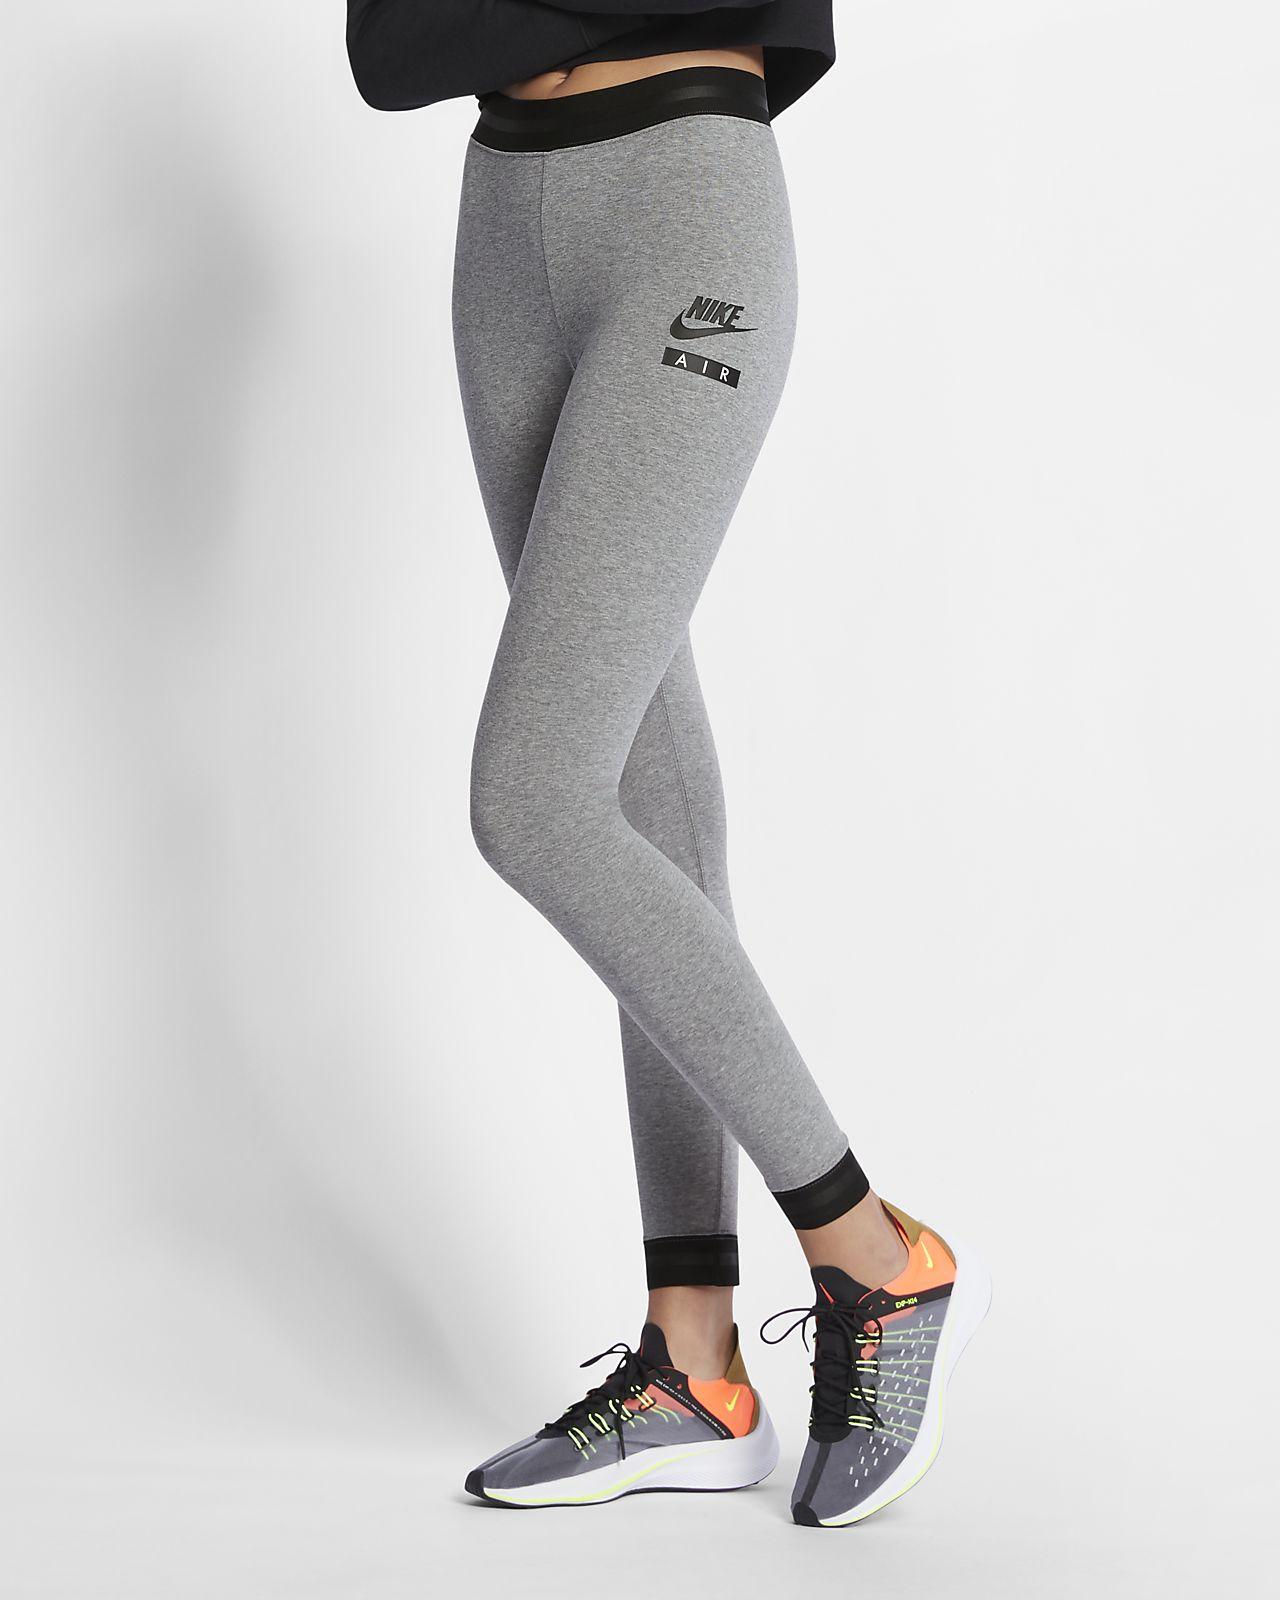 Nike Air Women's High-Waisted Leggings